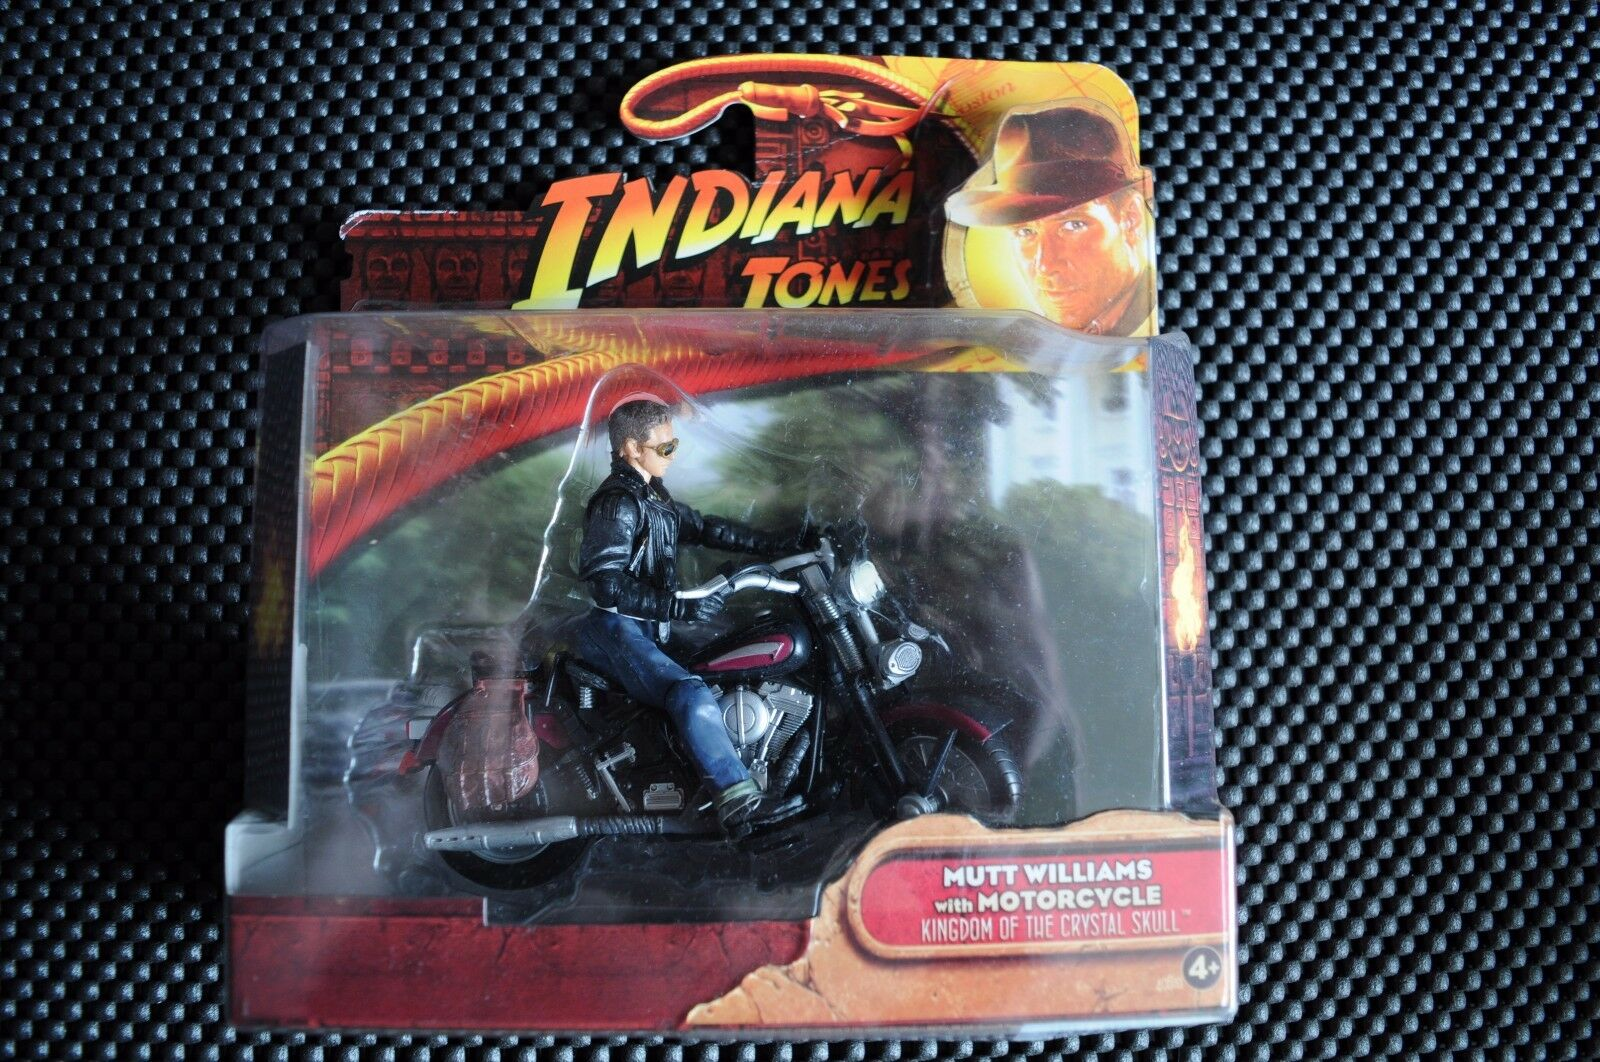 INDIANA JONES KINGDOM OF THE CRYSTAL SKULL MUTT MUTT MUTT WILLIAMS & MOTORCYCLE FIGURE f7ba0d